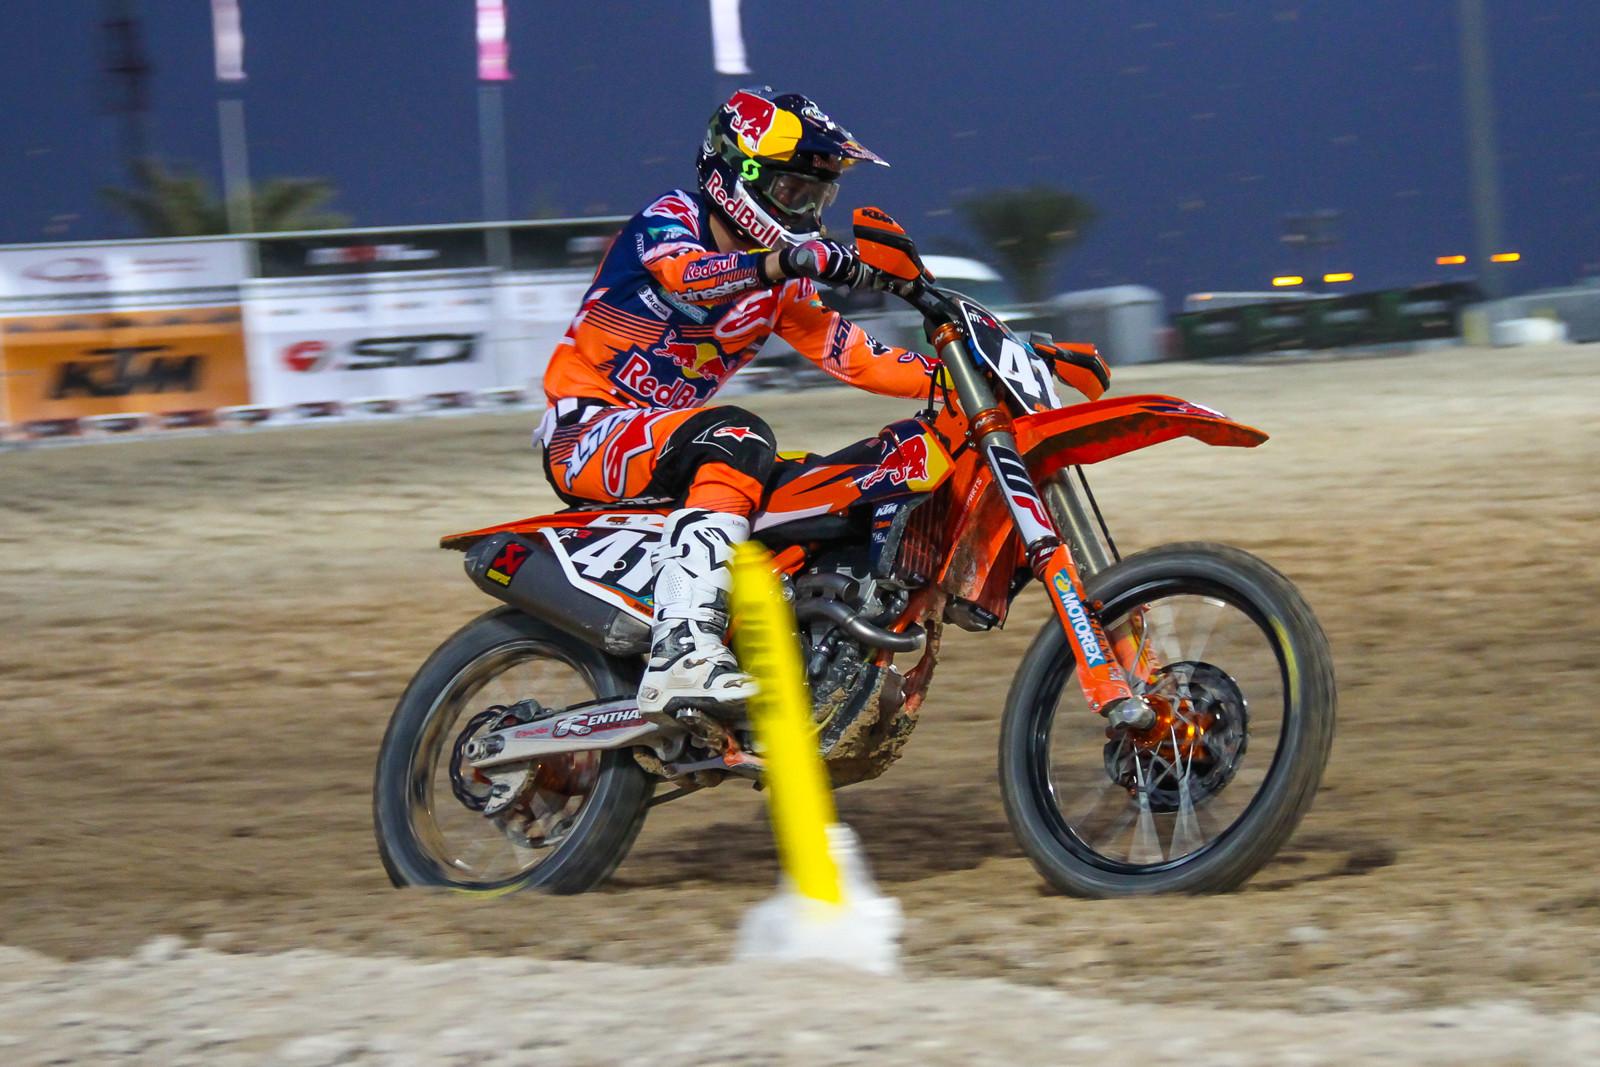 Pauls Jonass - Photo Blast: 2017 MXGP of Qatar - Motocross Pictures - Vital MX